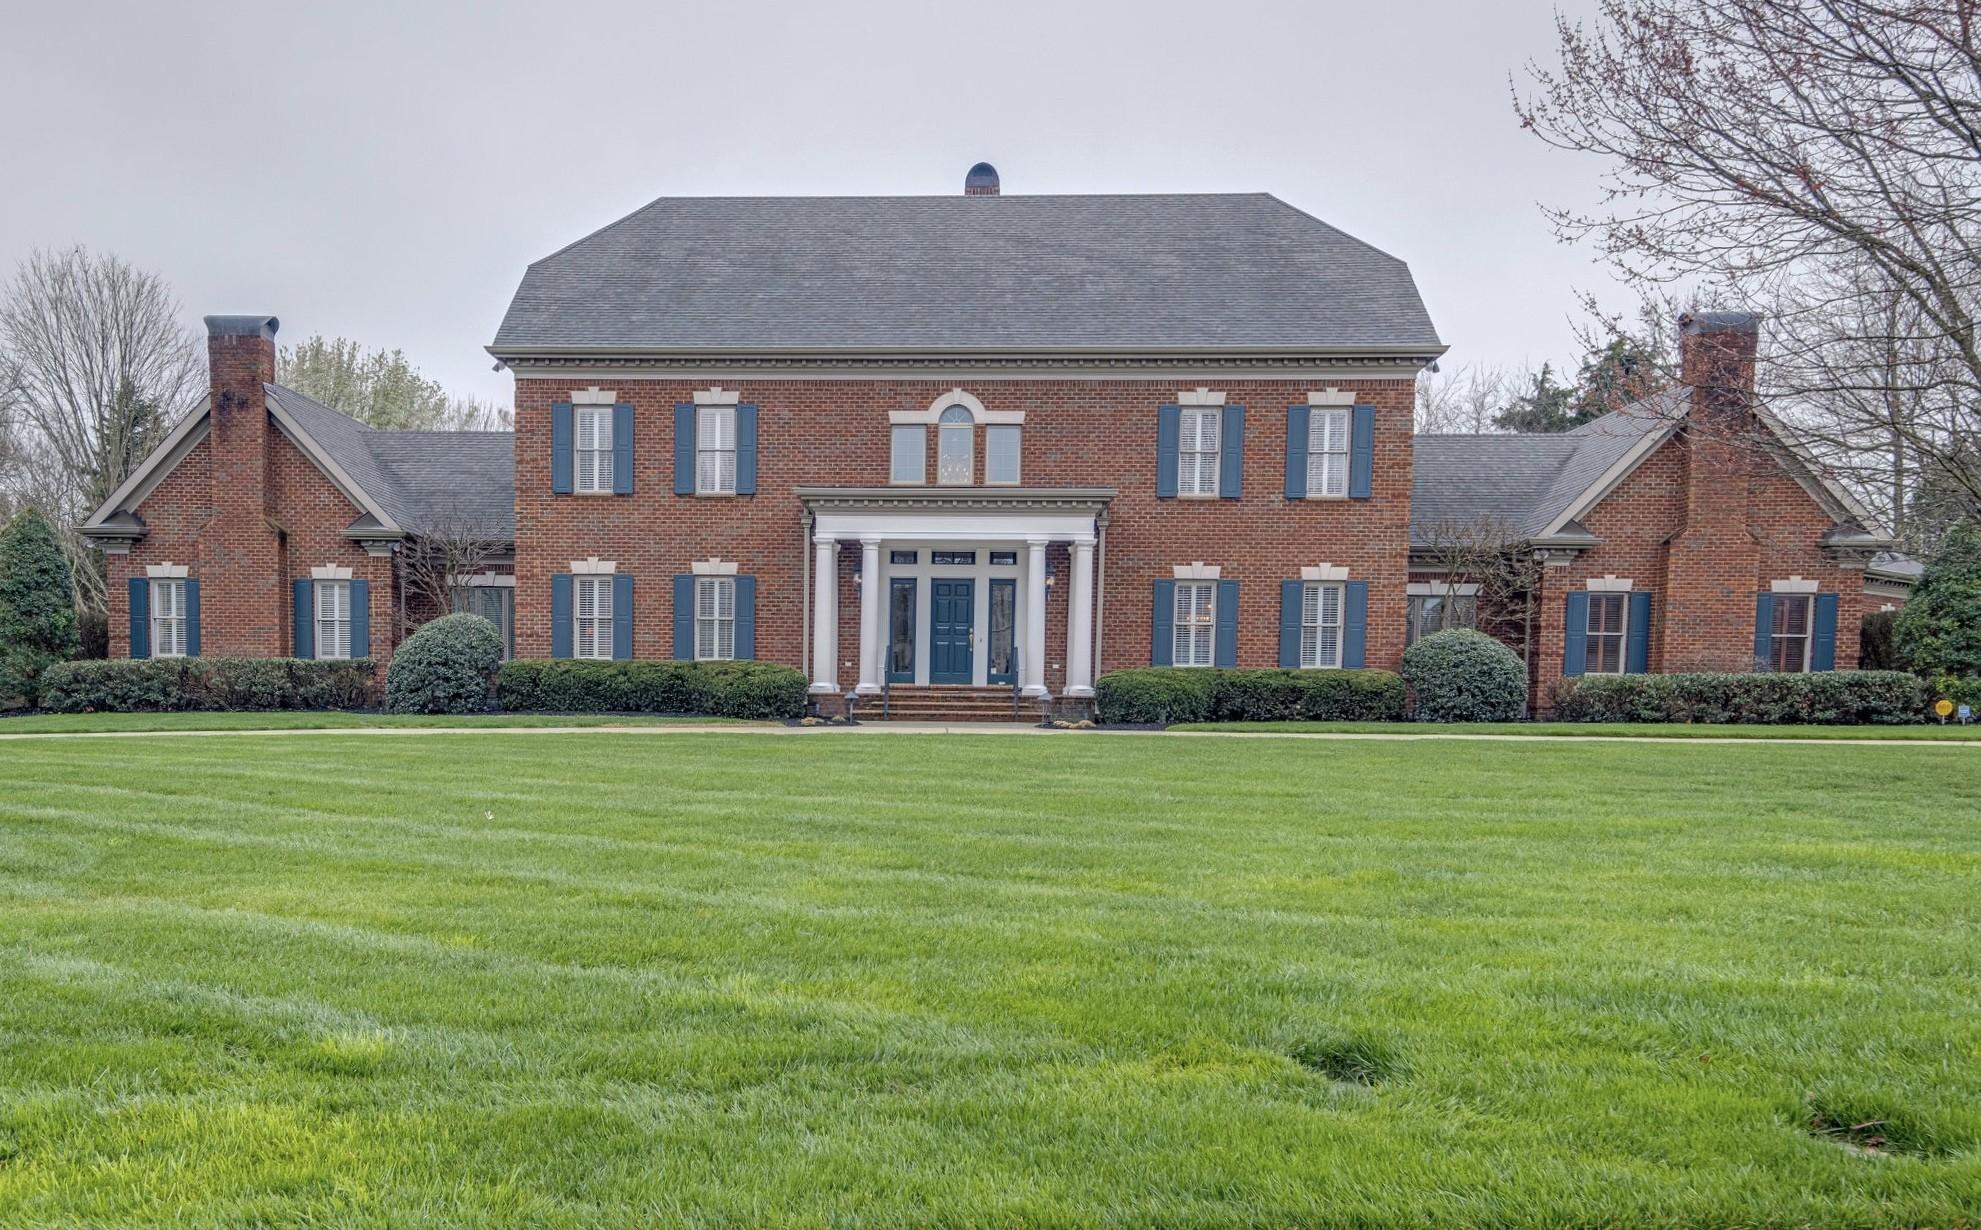 1727 Shagbark Trl, Murfreesboro, TN 37130 - Murfreesboro, TN real estate listing